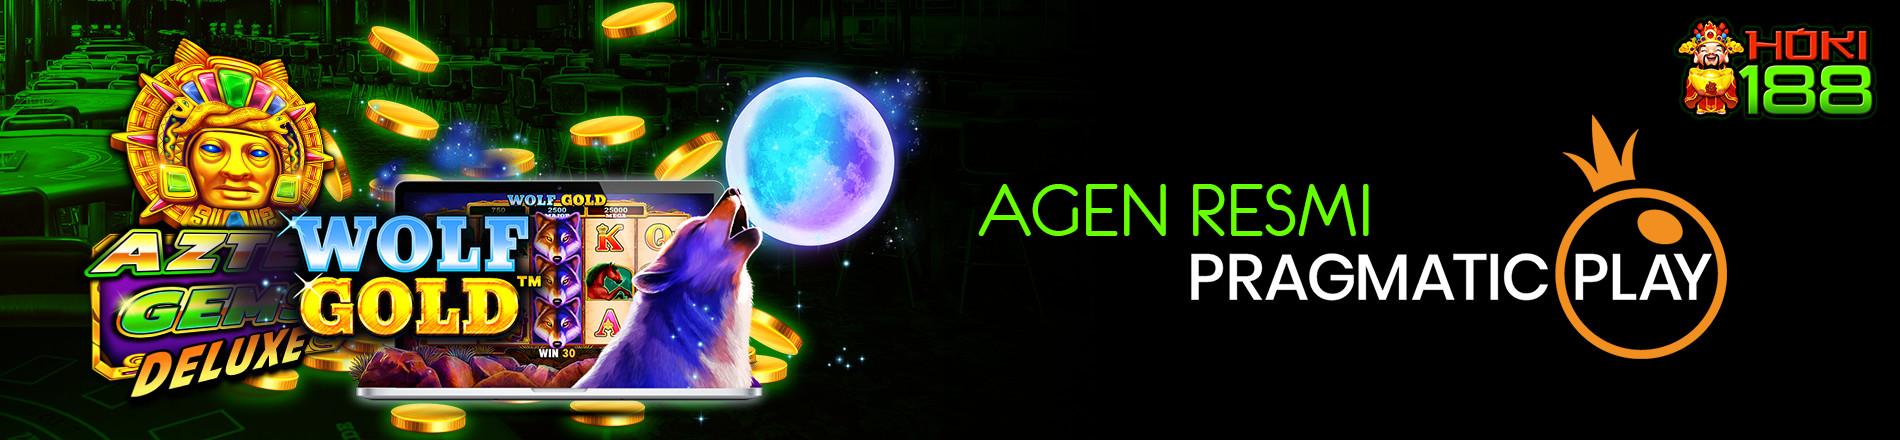 Hoki188 Agent Resmi Pragmatic Play